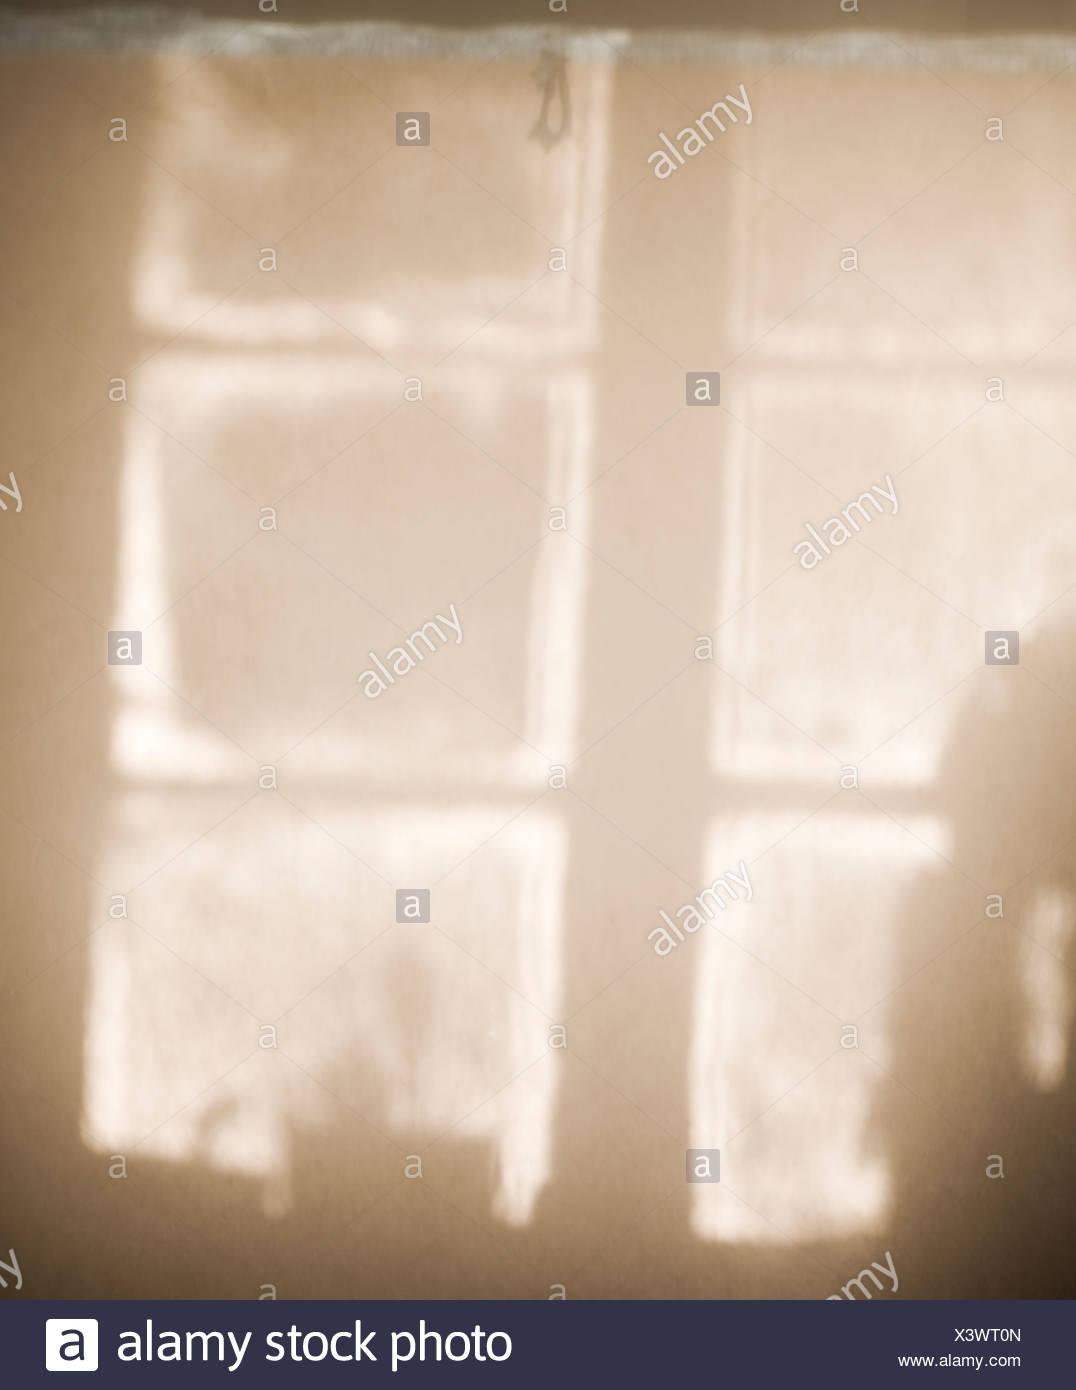 Skandinavien, Schweden, Skane, Ansicht des Fensters Stockbild